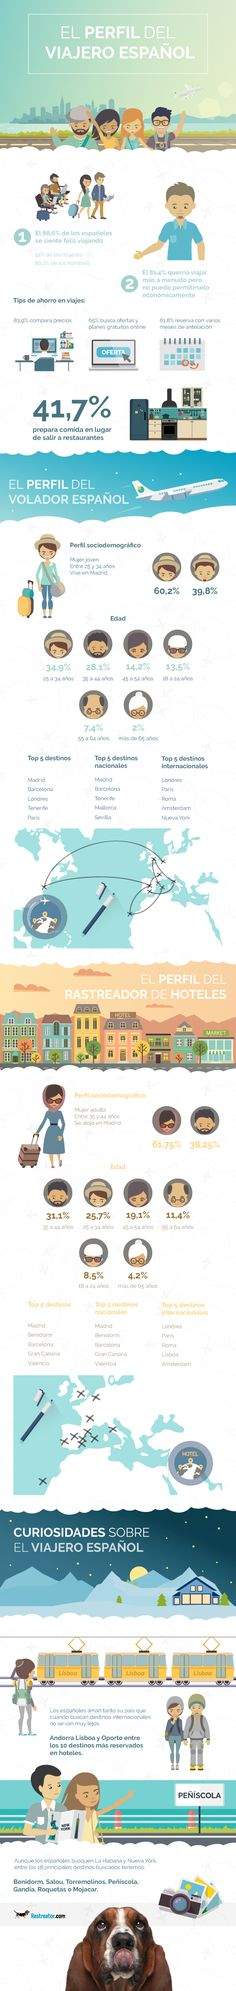 infografia-perfil-del-viajero